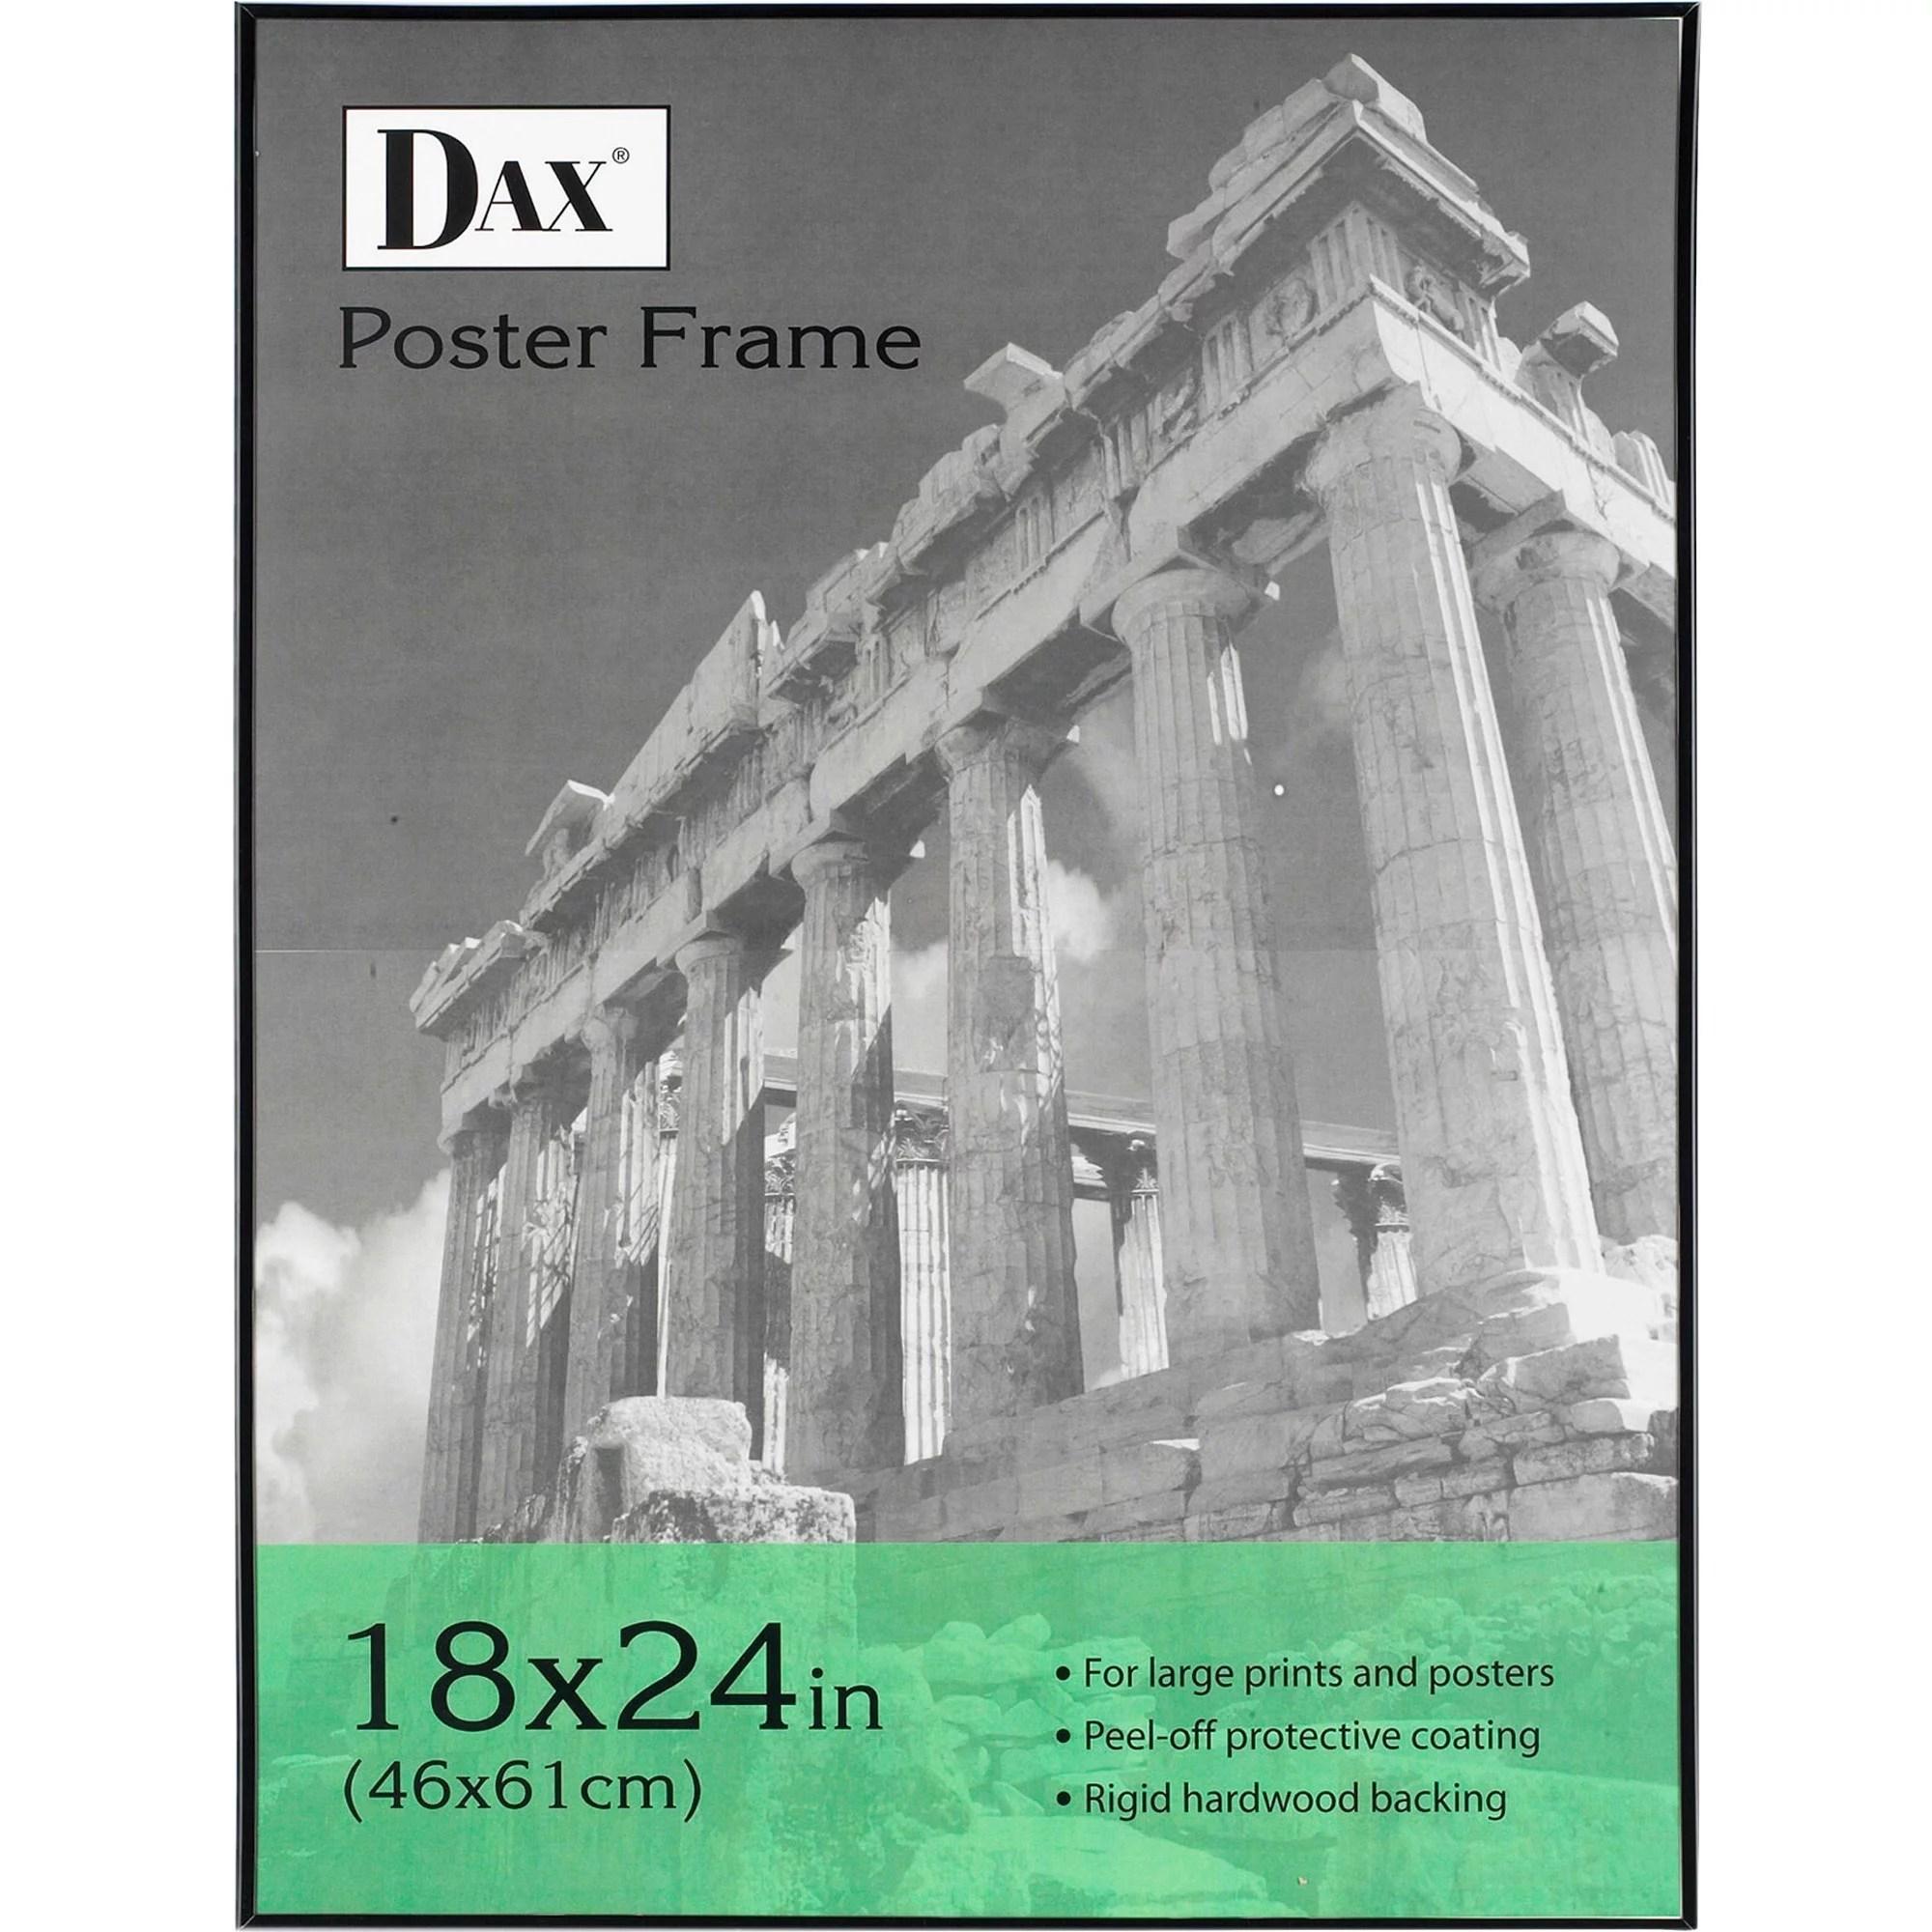 dax coloredge poster frame clear plastic window 16 x 20 black walmart com